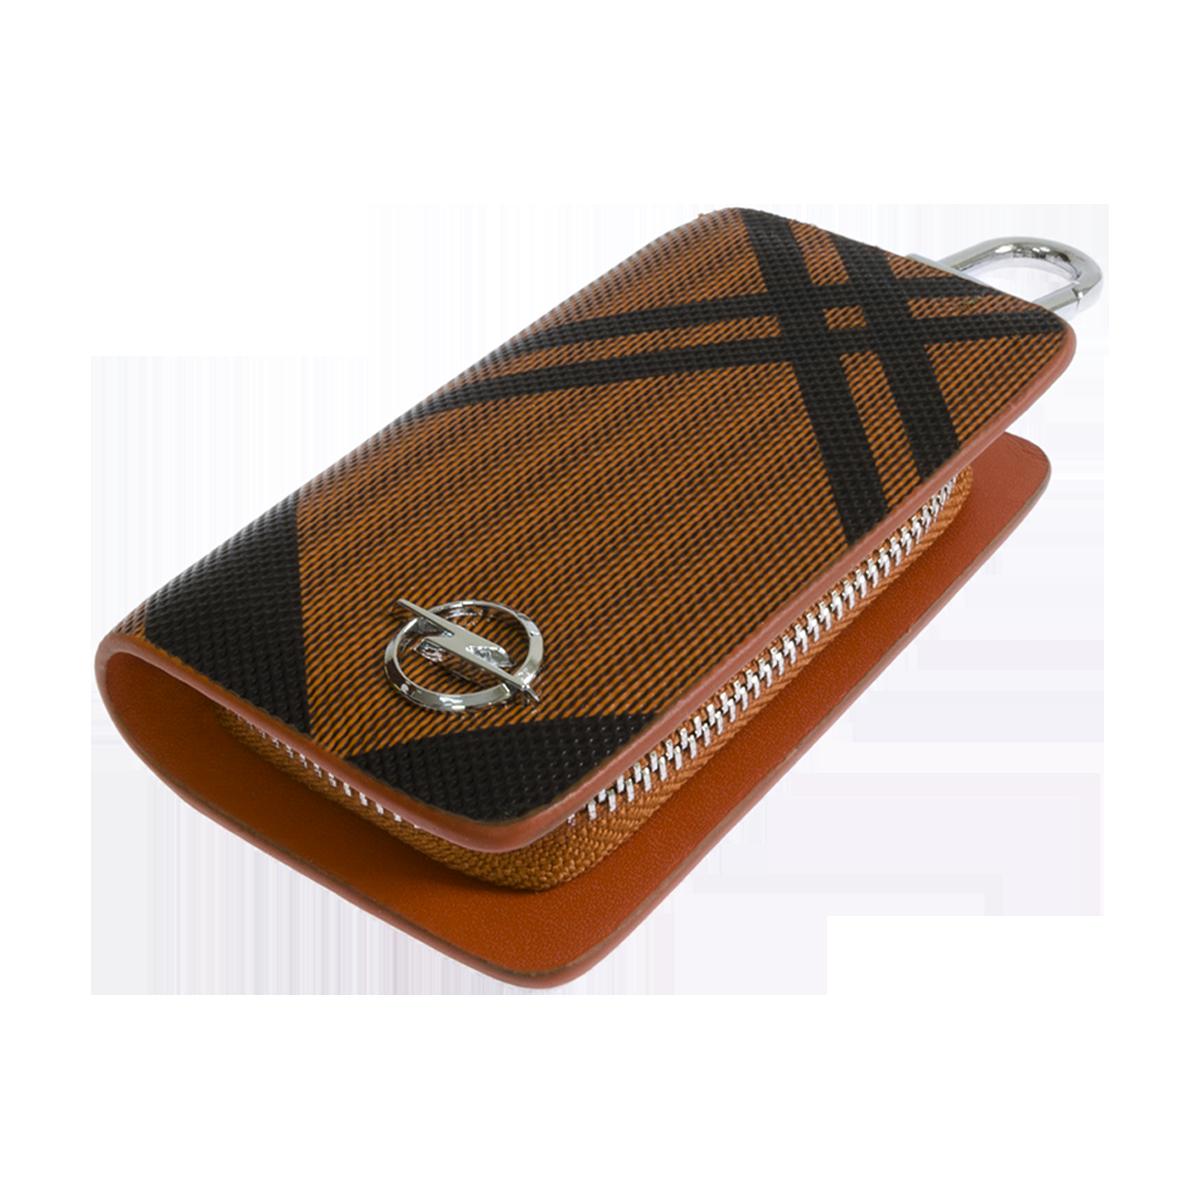 Ключница Carss с логотипом OPEL 18014 карбон коричневый